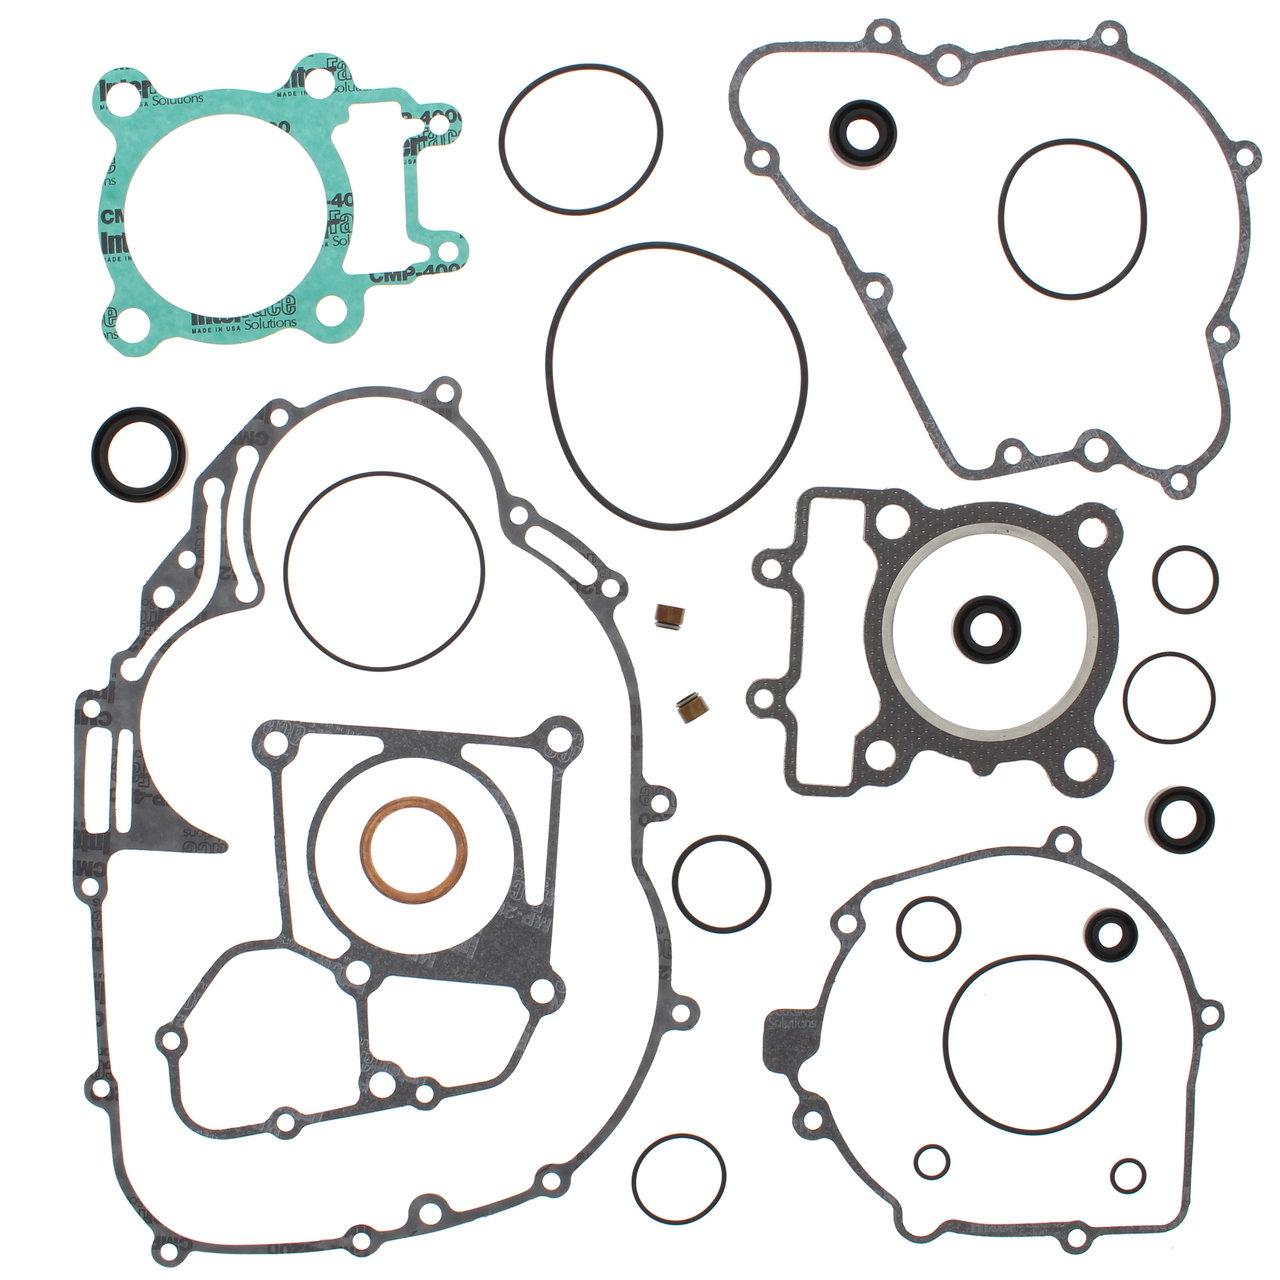 Complete Gasket Kit w/ Oil Seals Kawasaki KLF250 Bayou